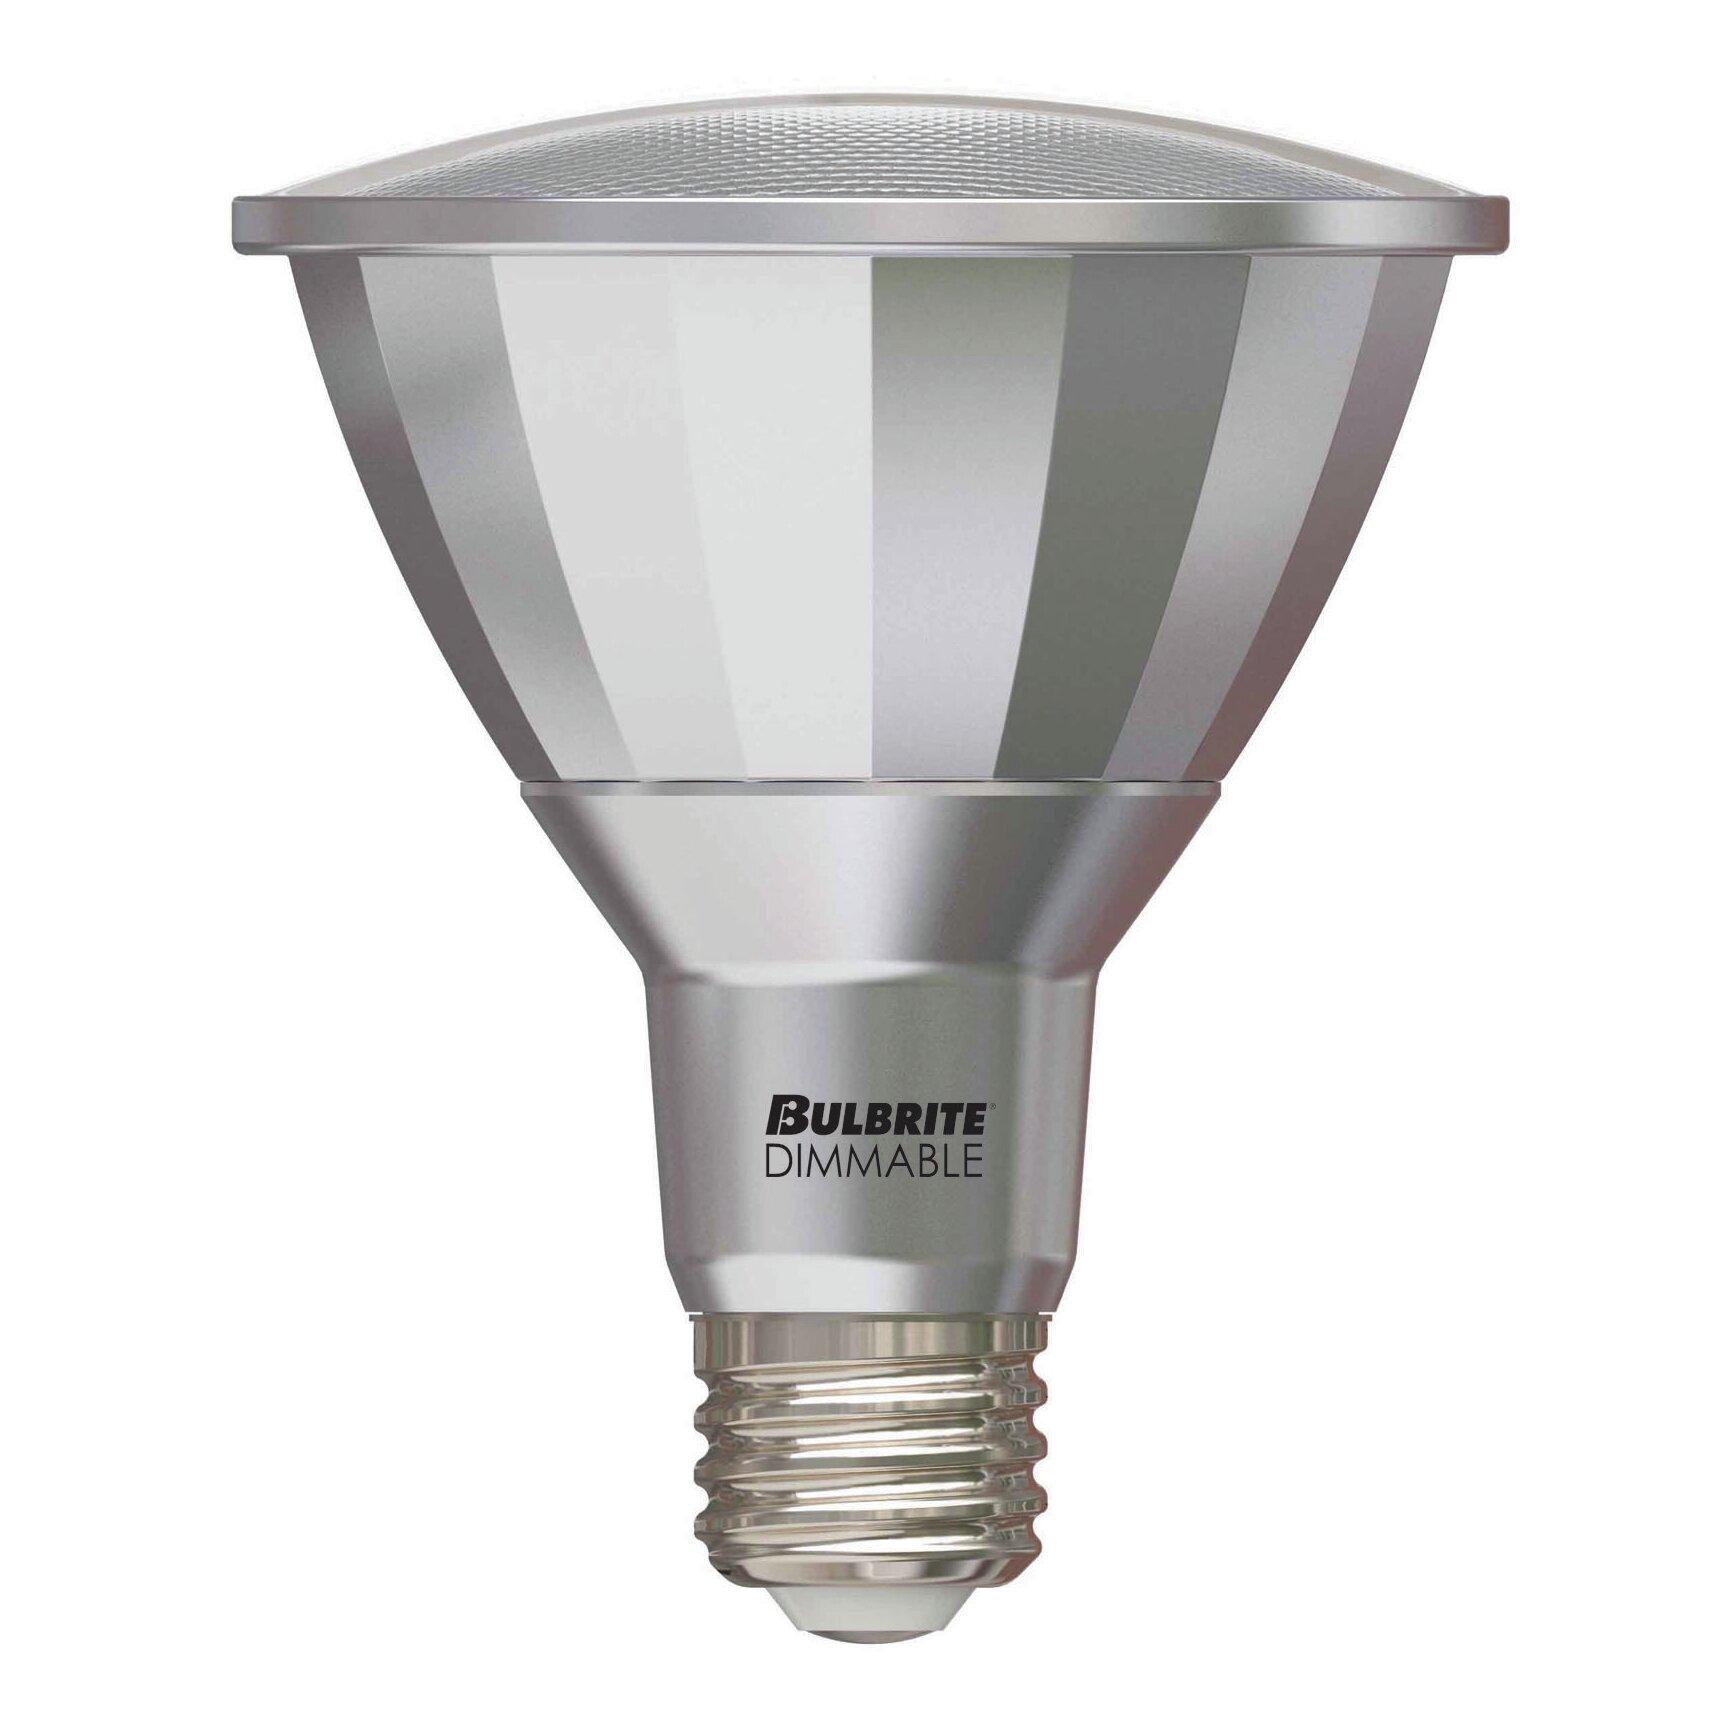 bulbrite industries 13w e26 medium base led light bulb. Black Bedroom Furniture Sets. Home Design Ideas